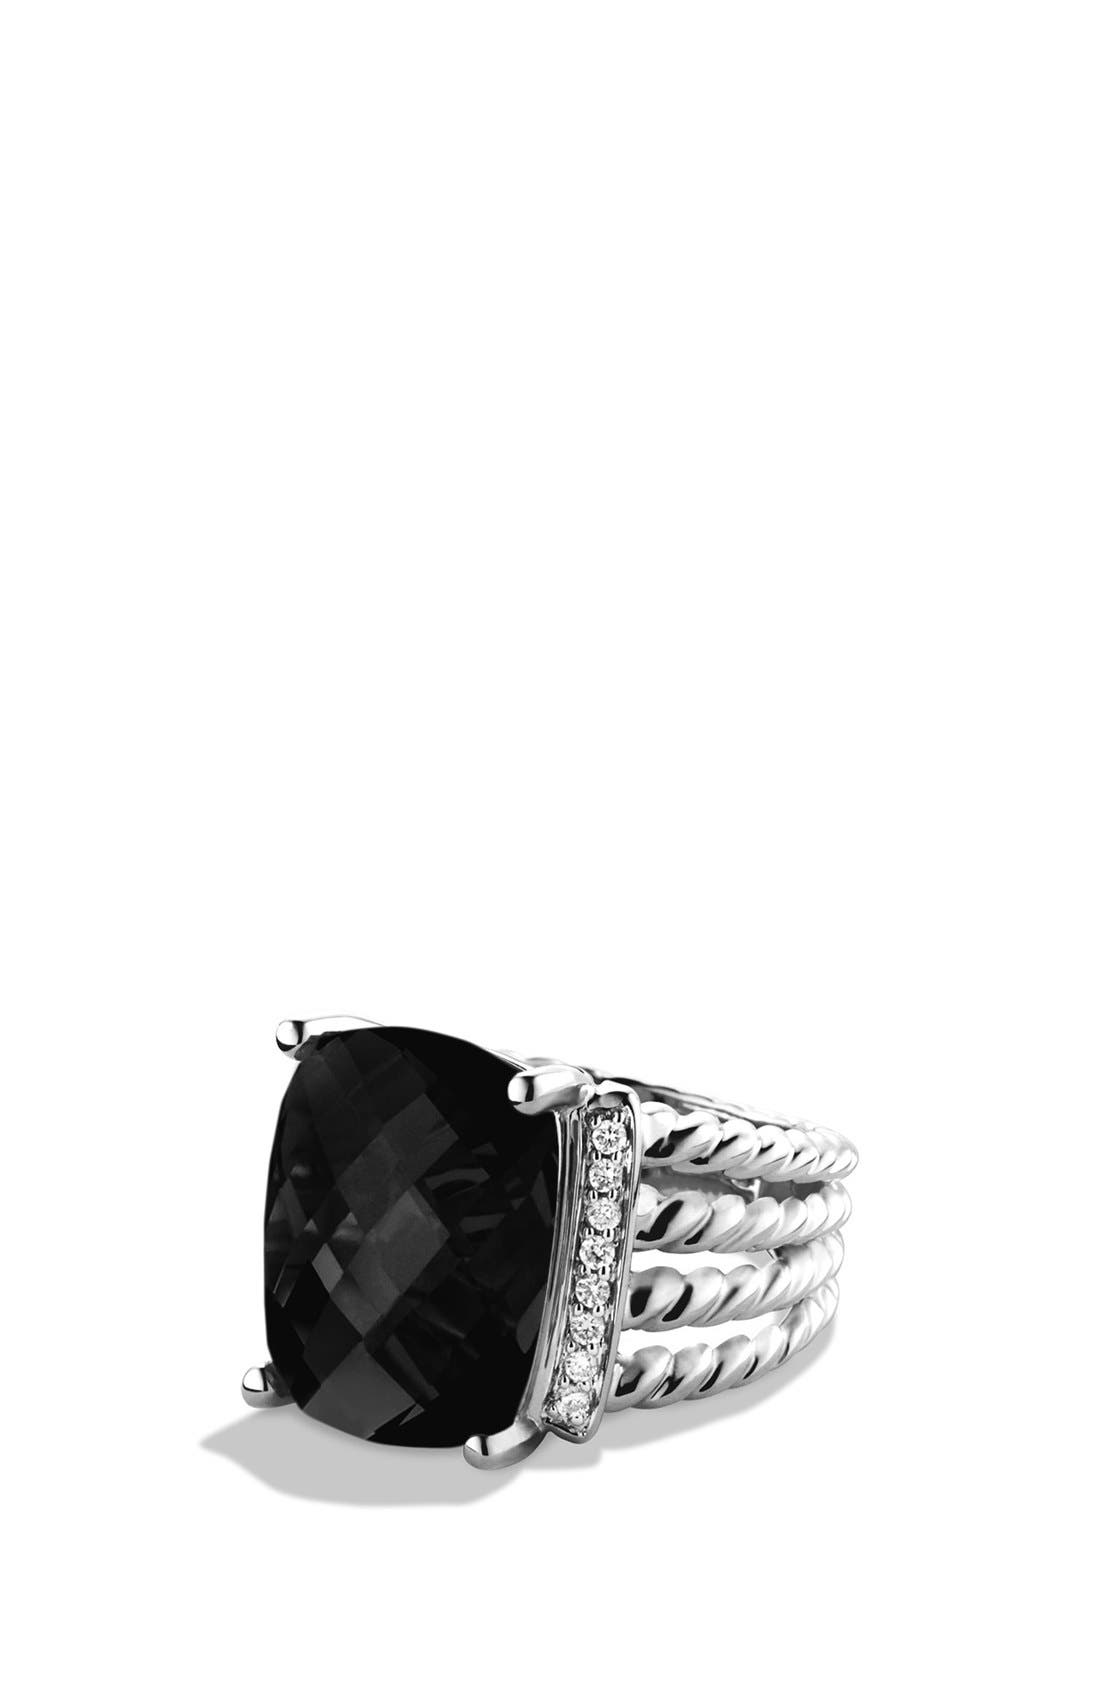 'Wheaton' Ring with Semiprecious Stone & Diamonds,                             Main thumbnail 1, color,                             BLACK ONYX